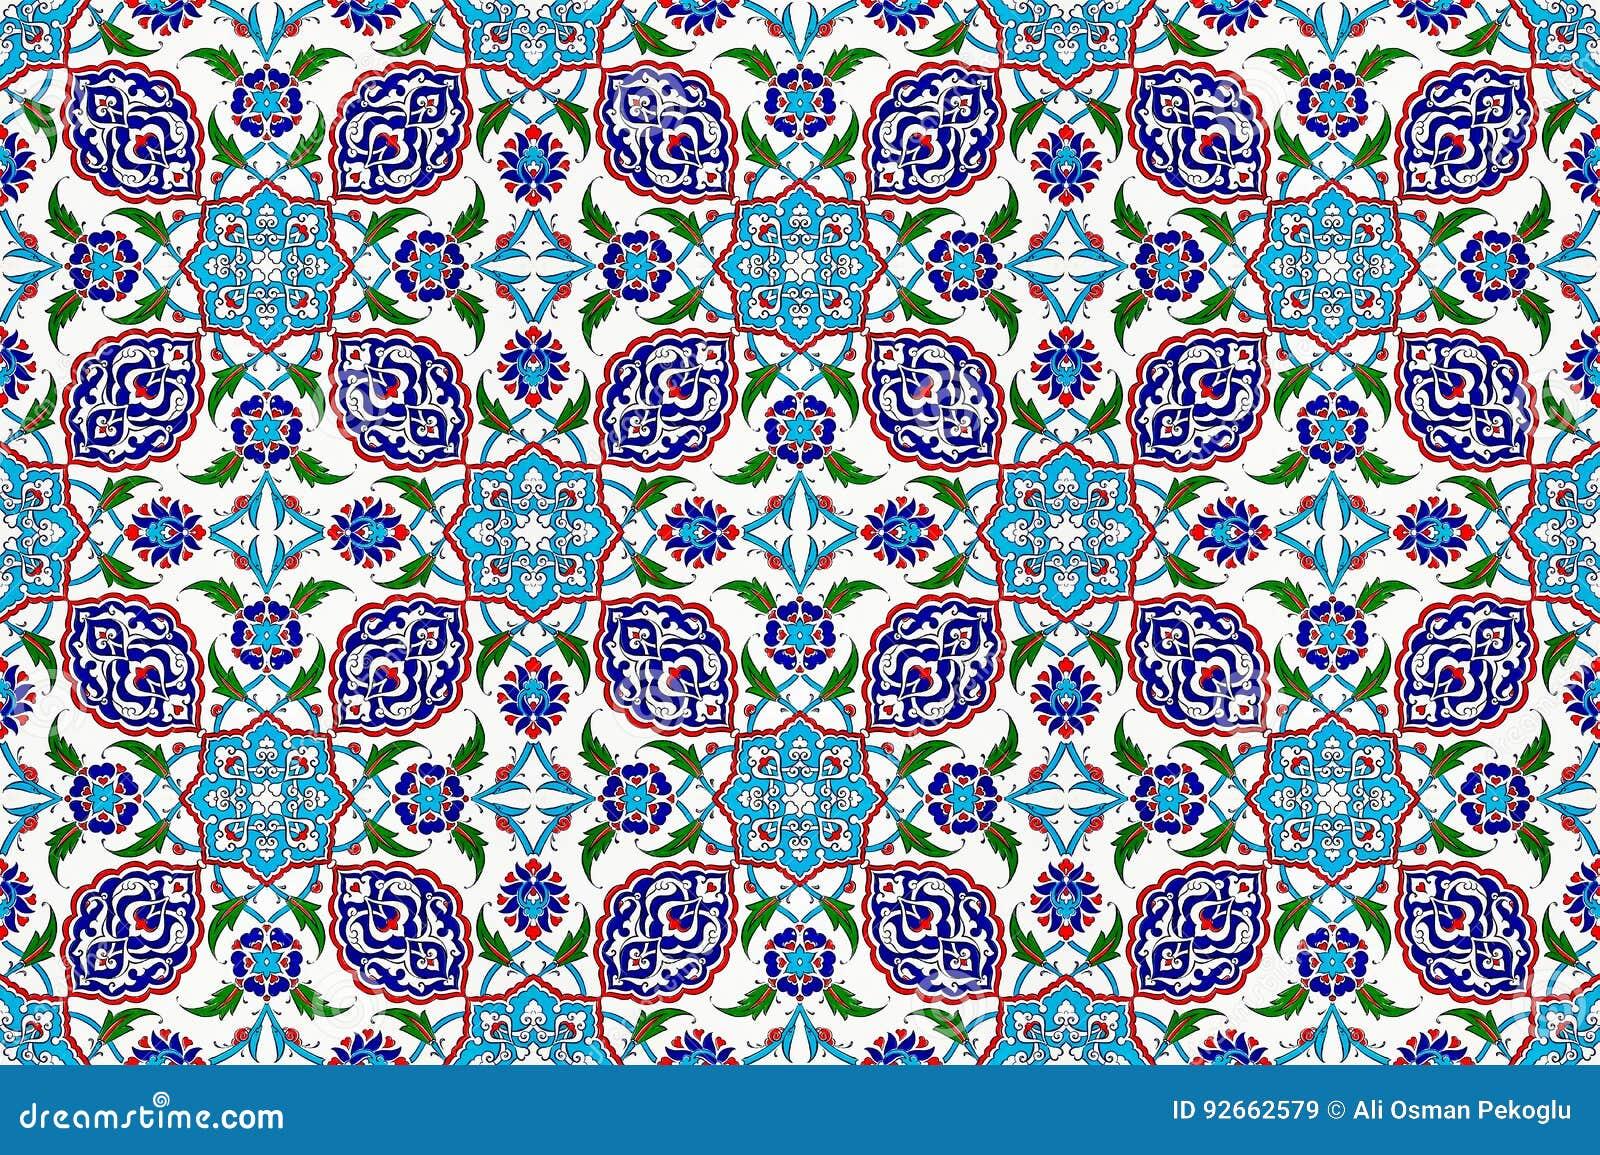 Mosaic Tile Pattern,islamic Motif Stock Image - Image of empire ...